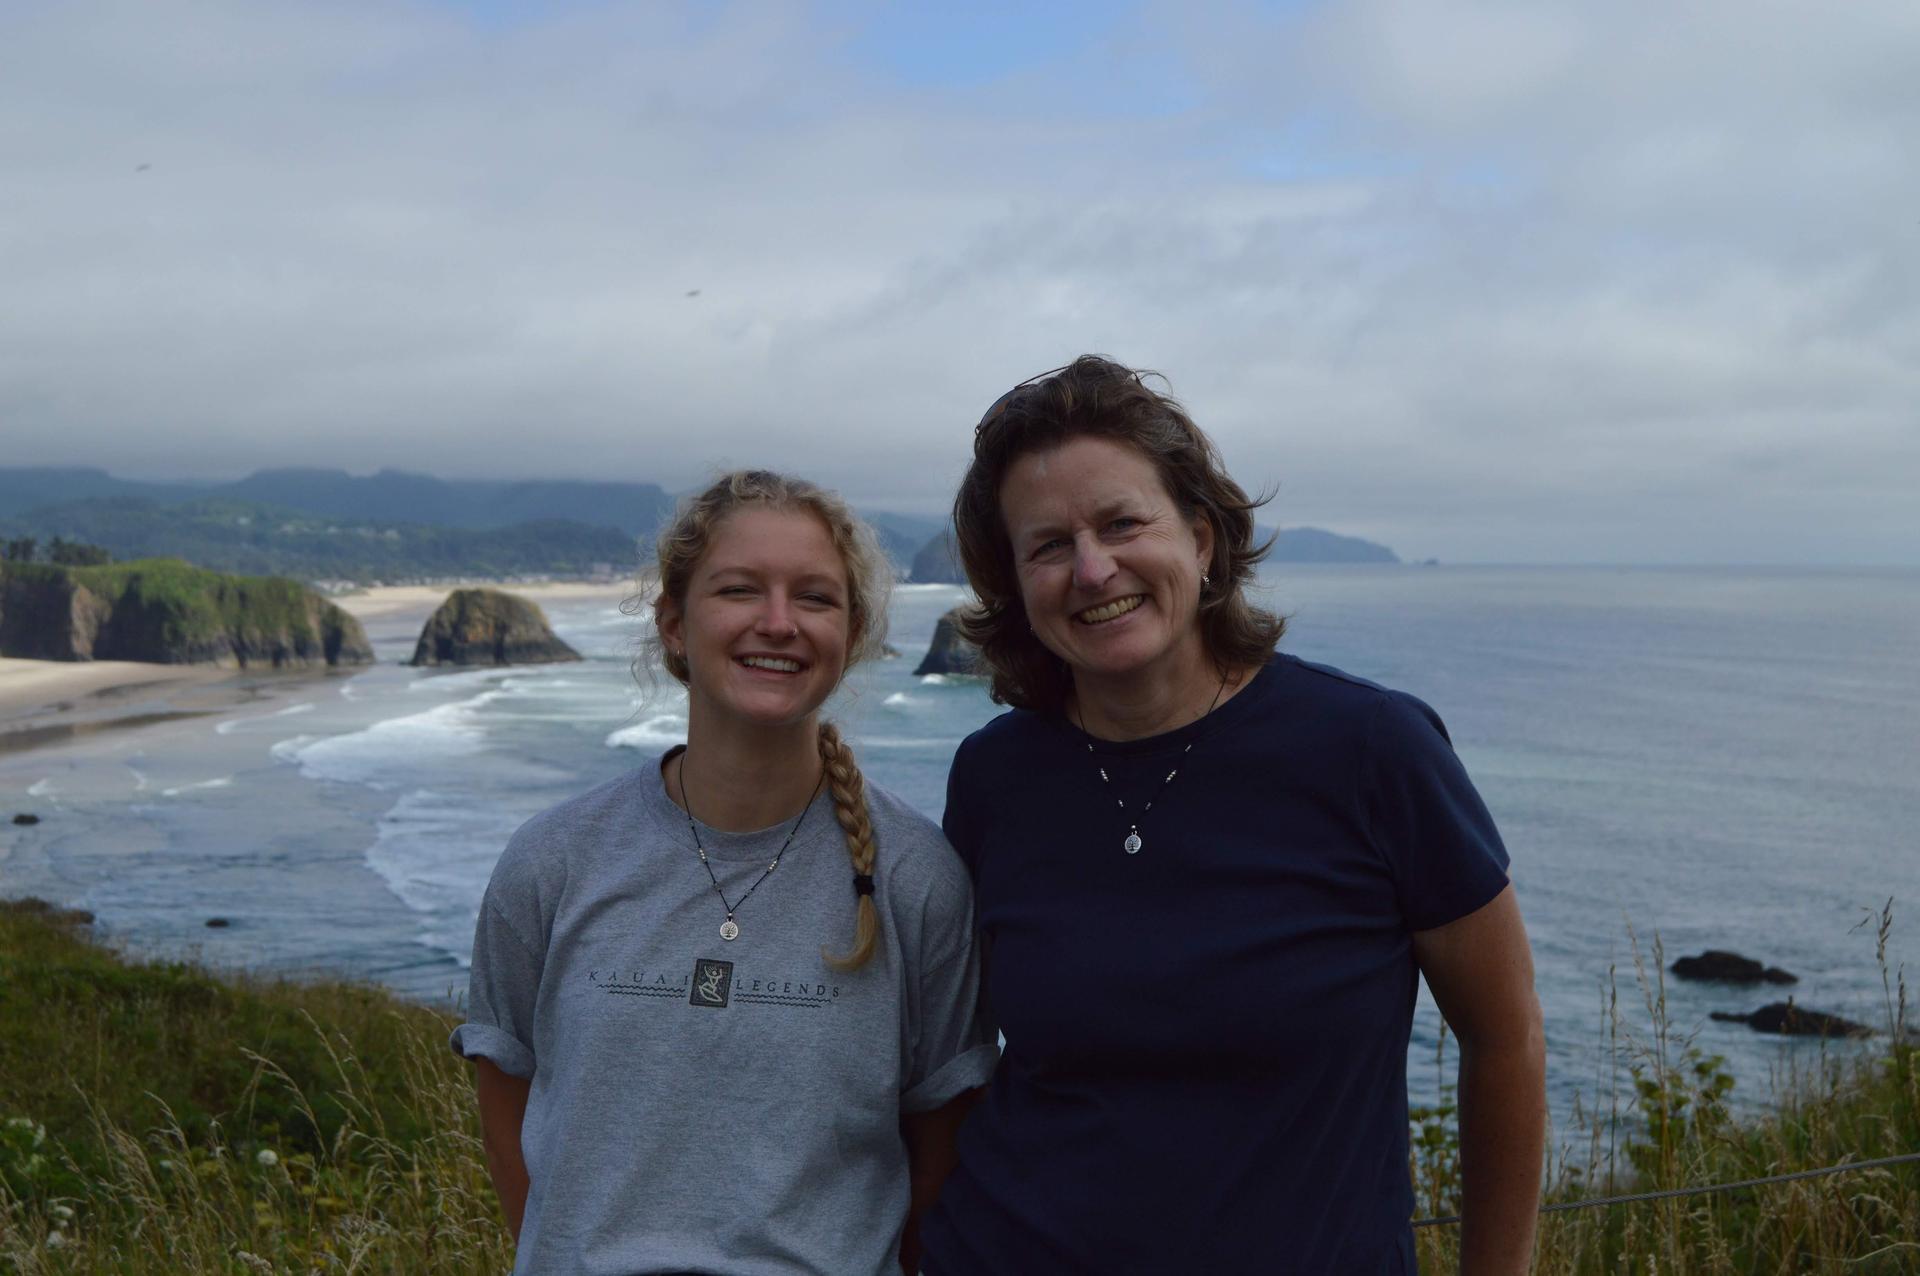 Megan & I at Cannon Beach, OR